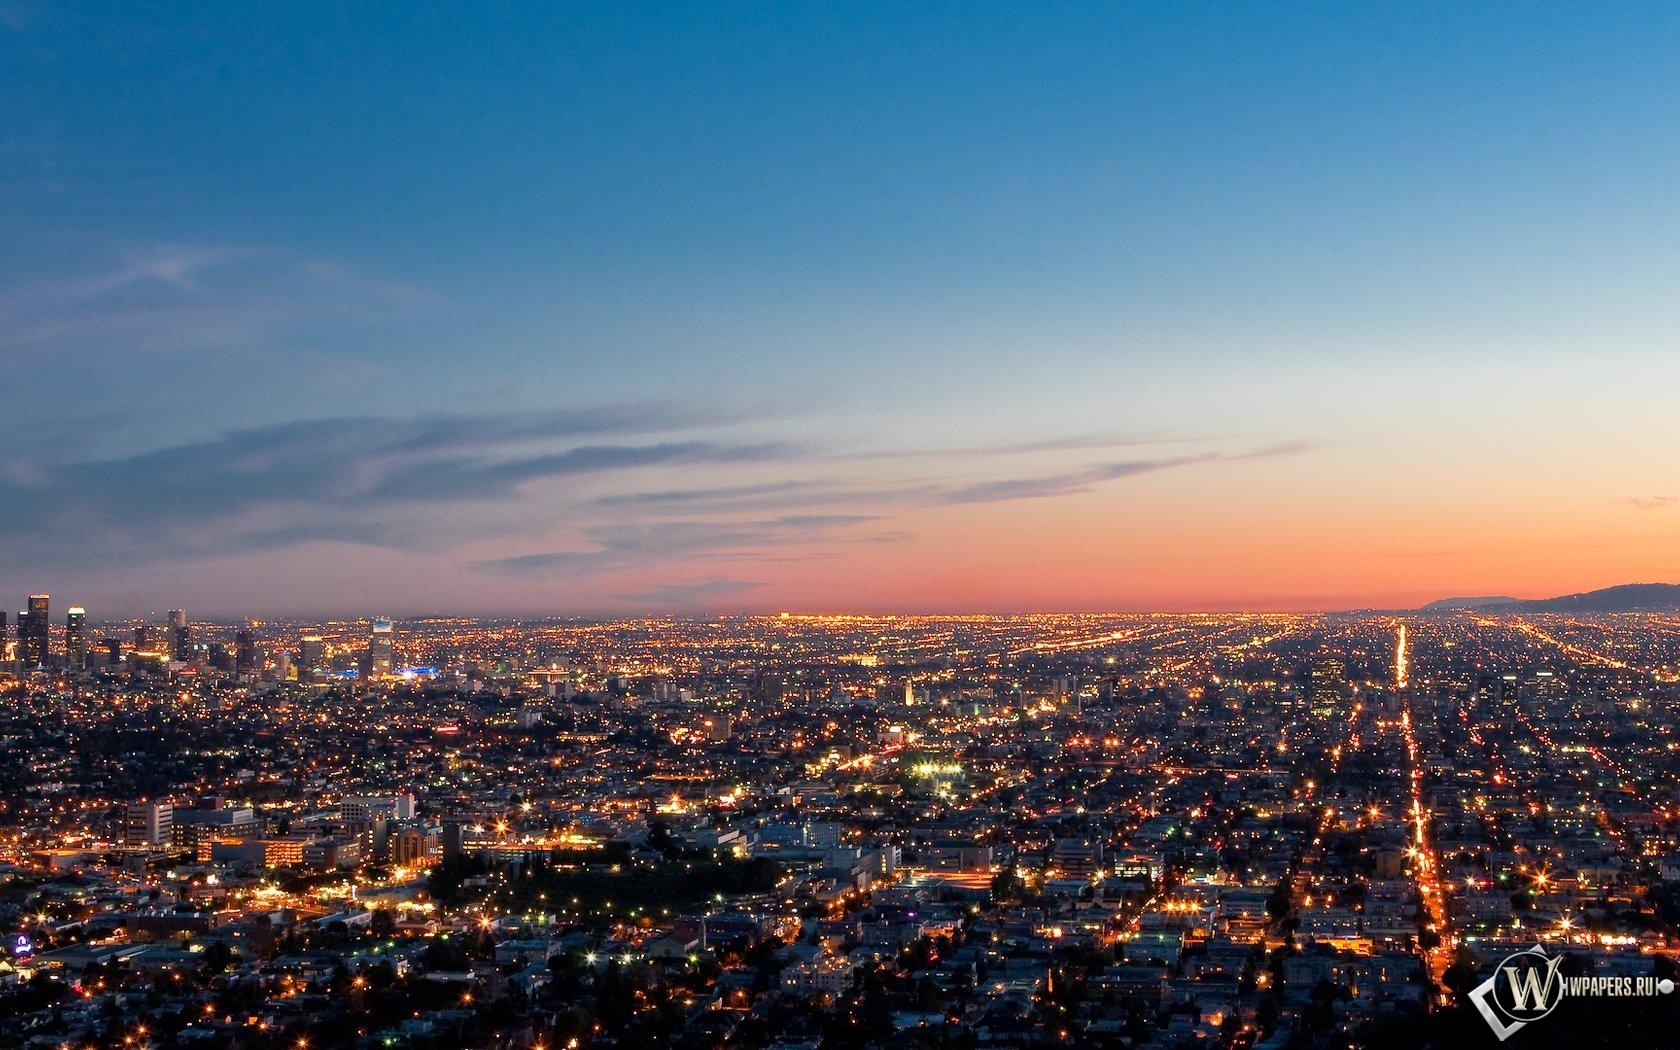 Los Angeles 1680x1050